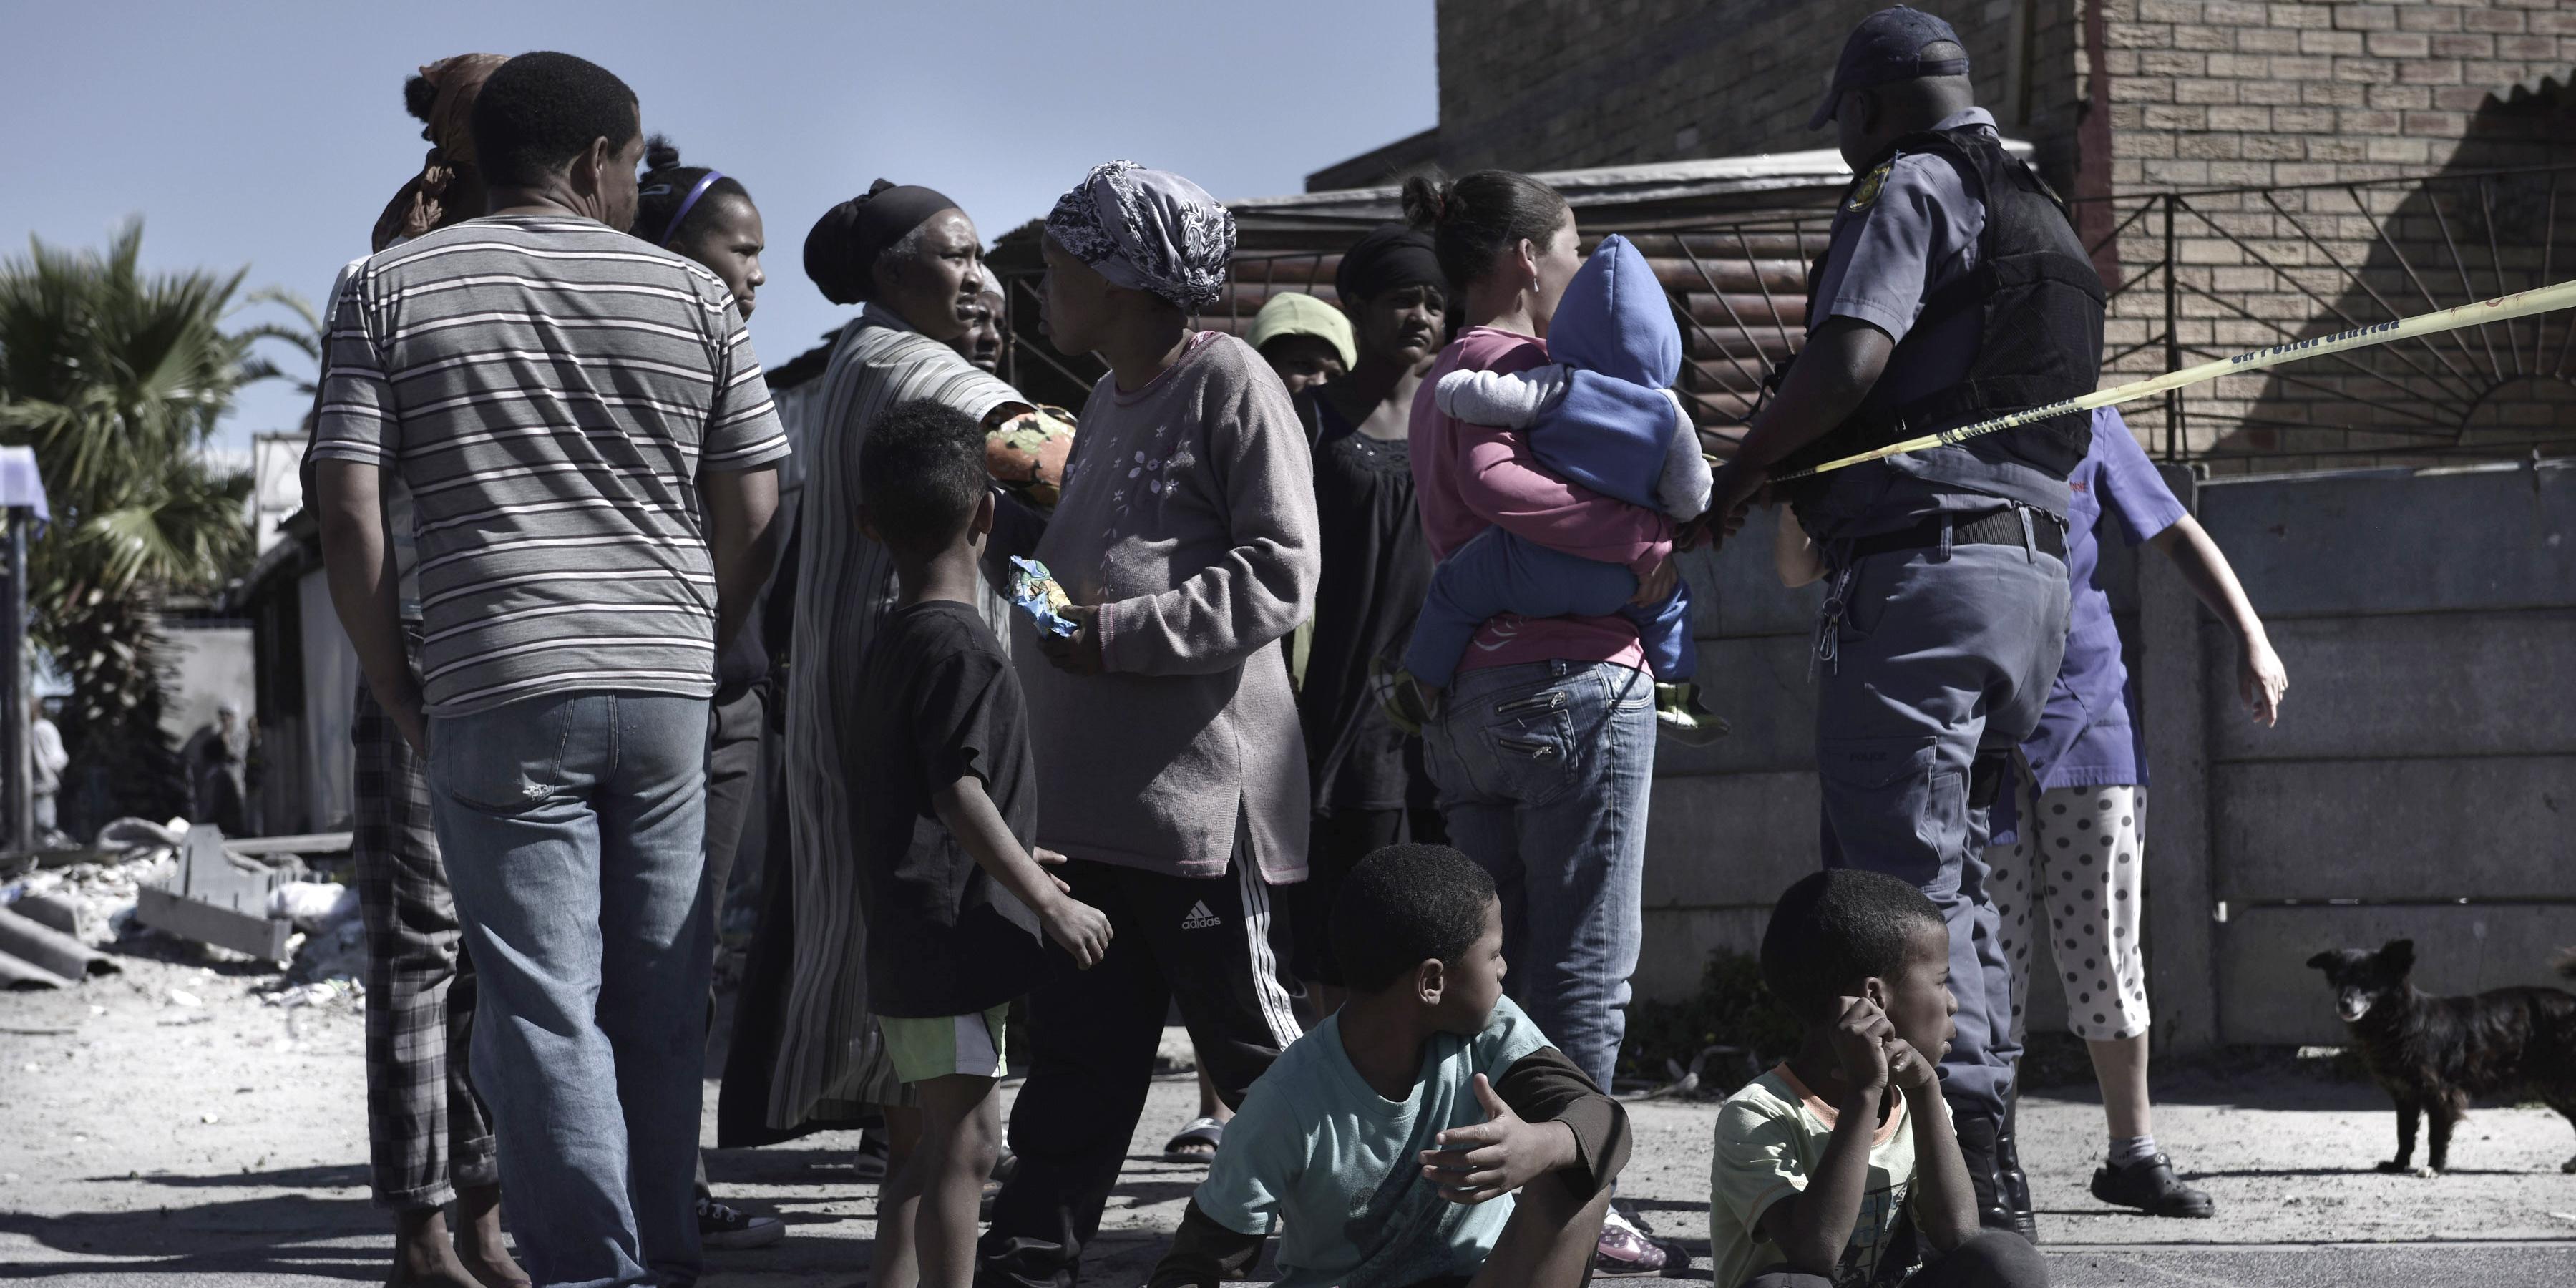 Sud Africa, Città del Capo, gang